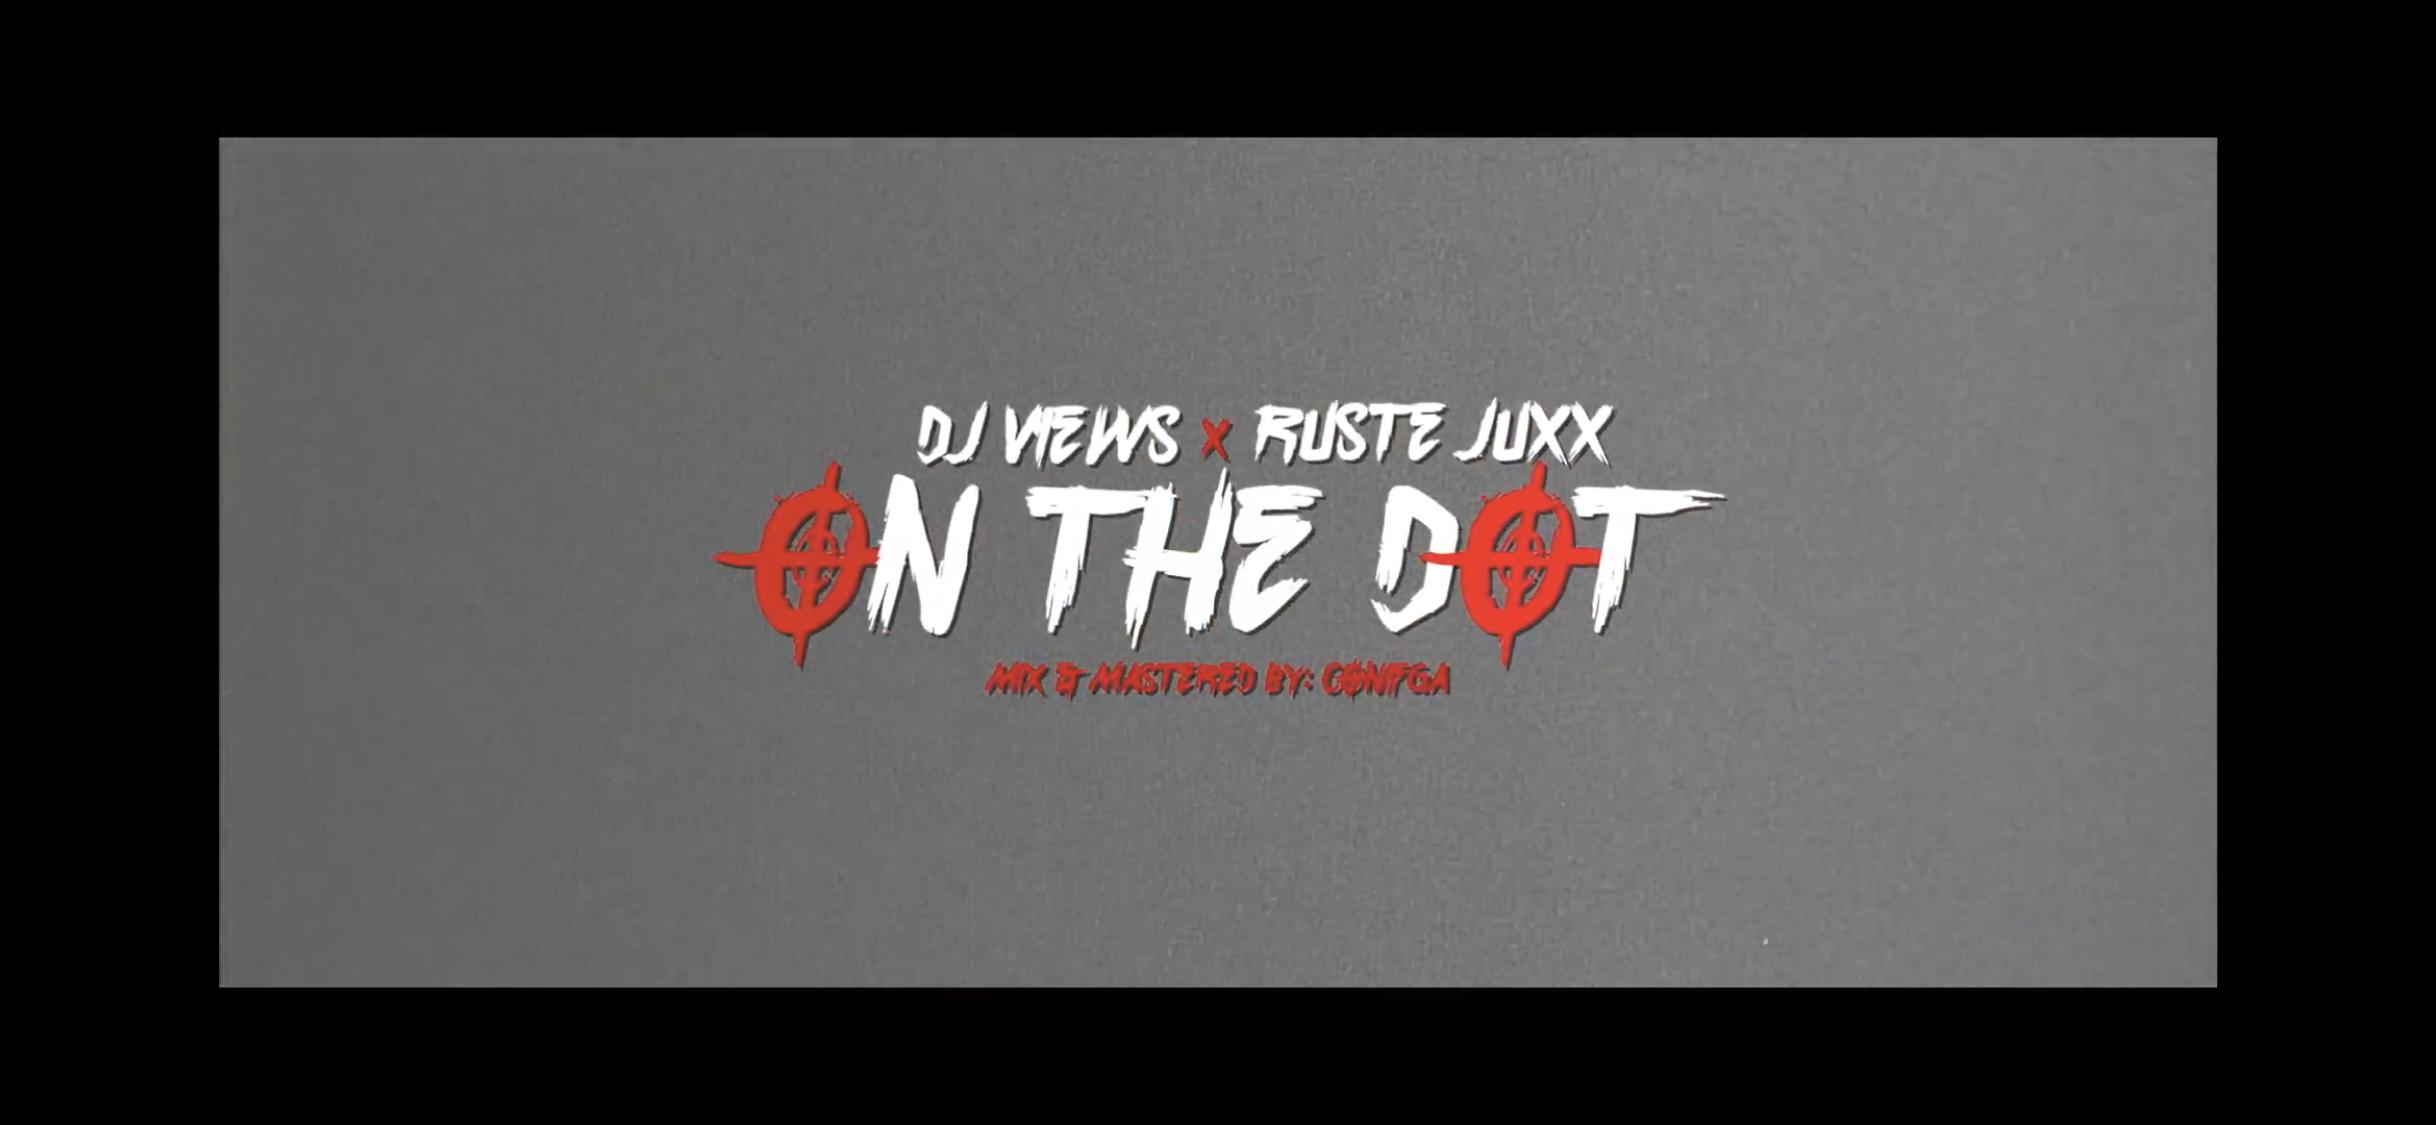 "Configa & DJ Views ""On the Dot"" feat. Ruste Juxx (Official Music Video)"